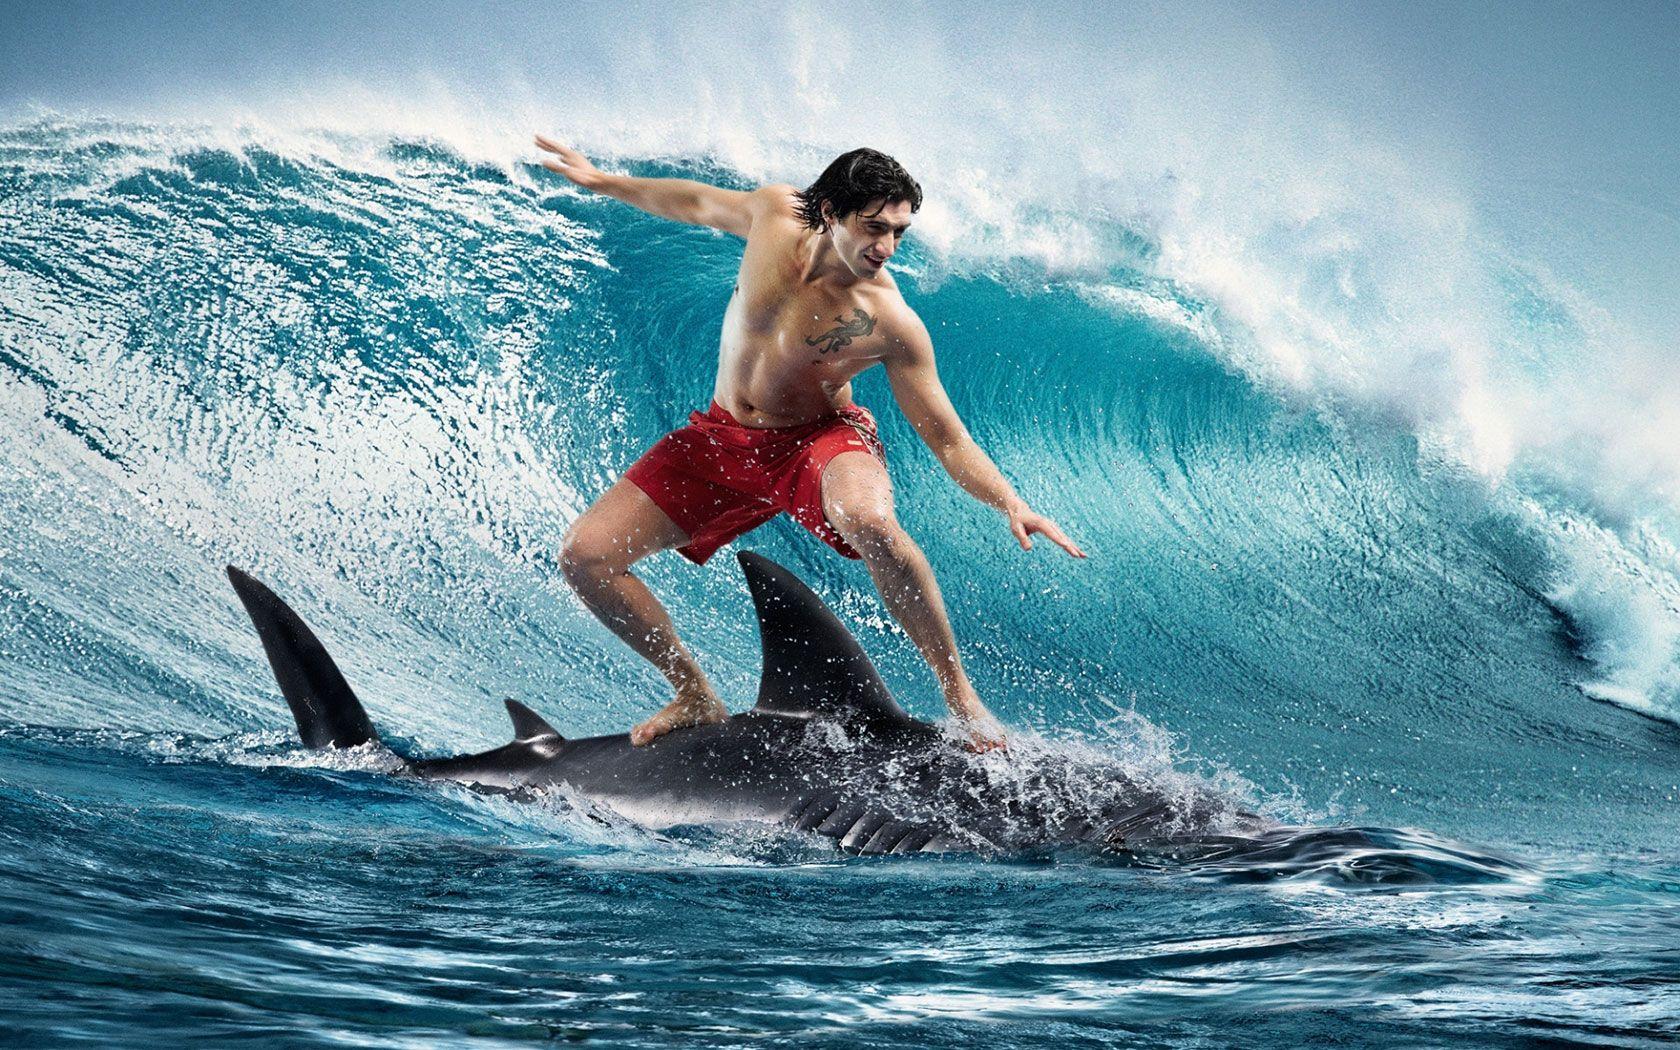 Shark Surfing HD Background Wallpaper